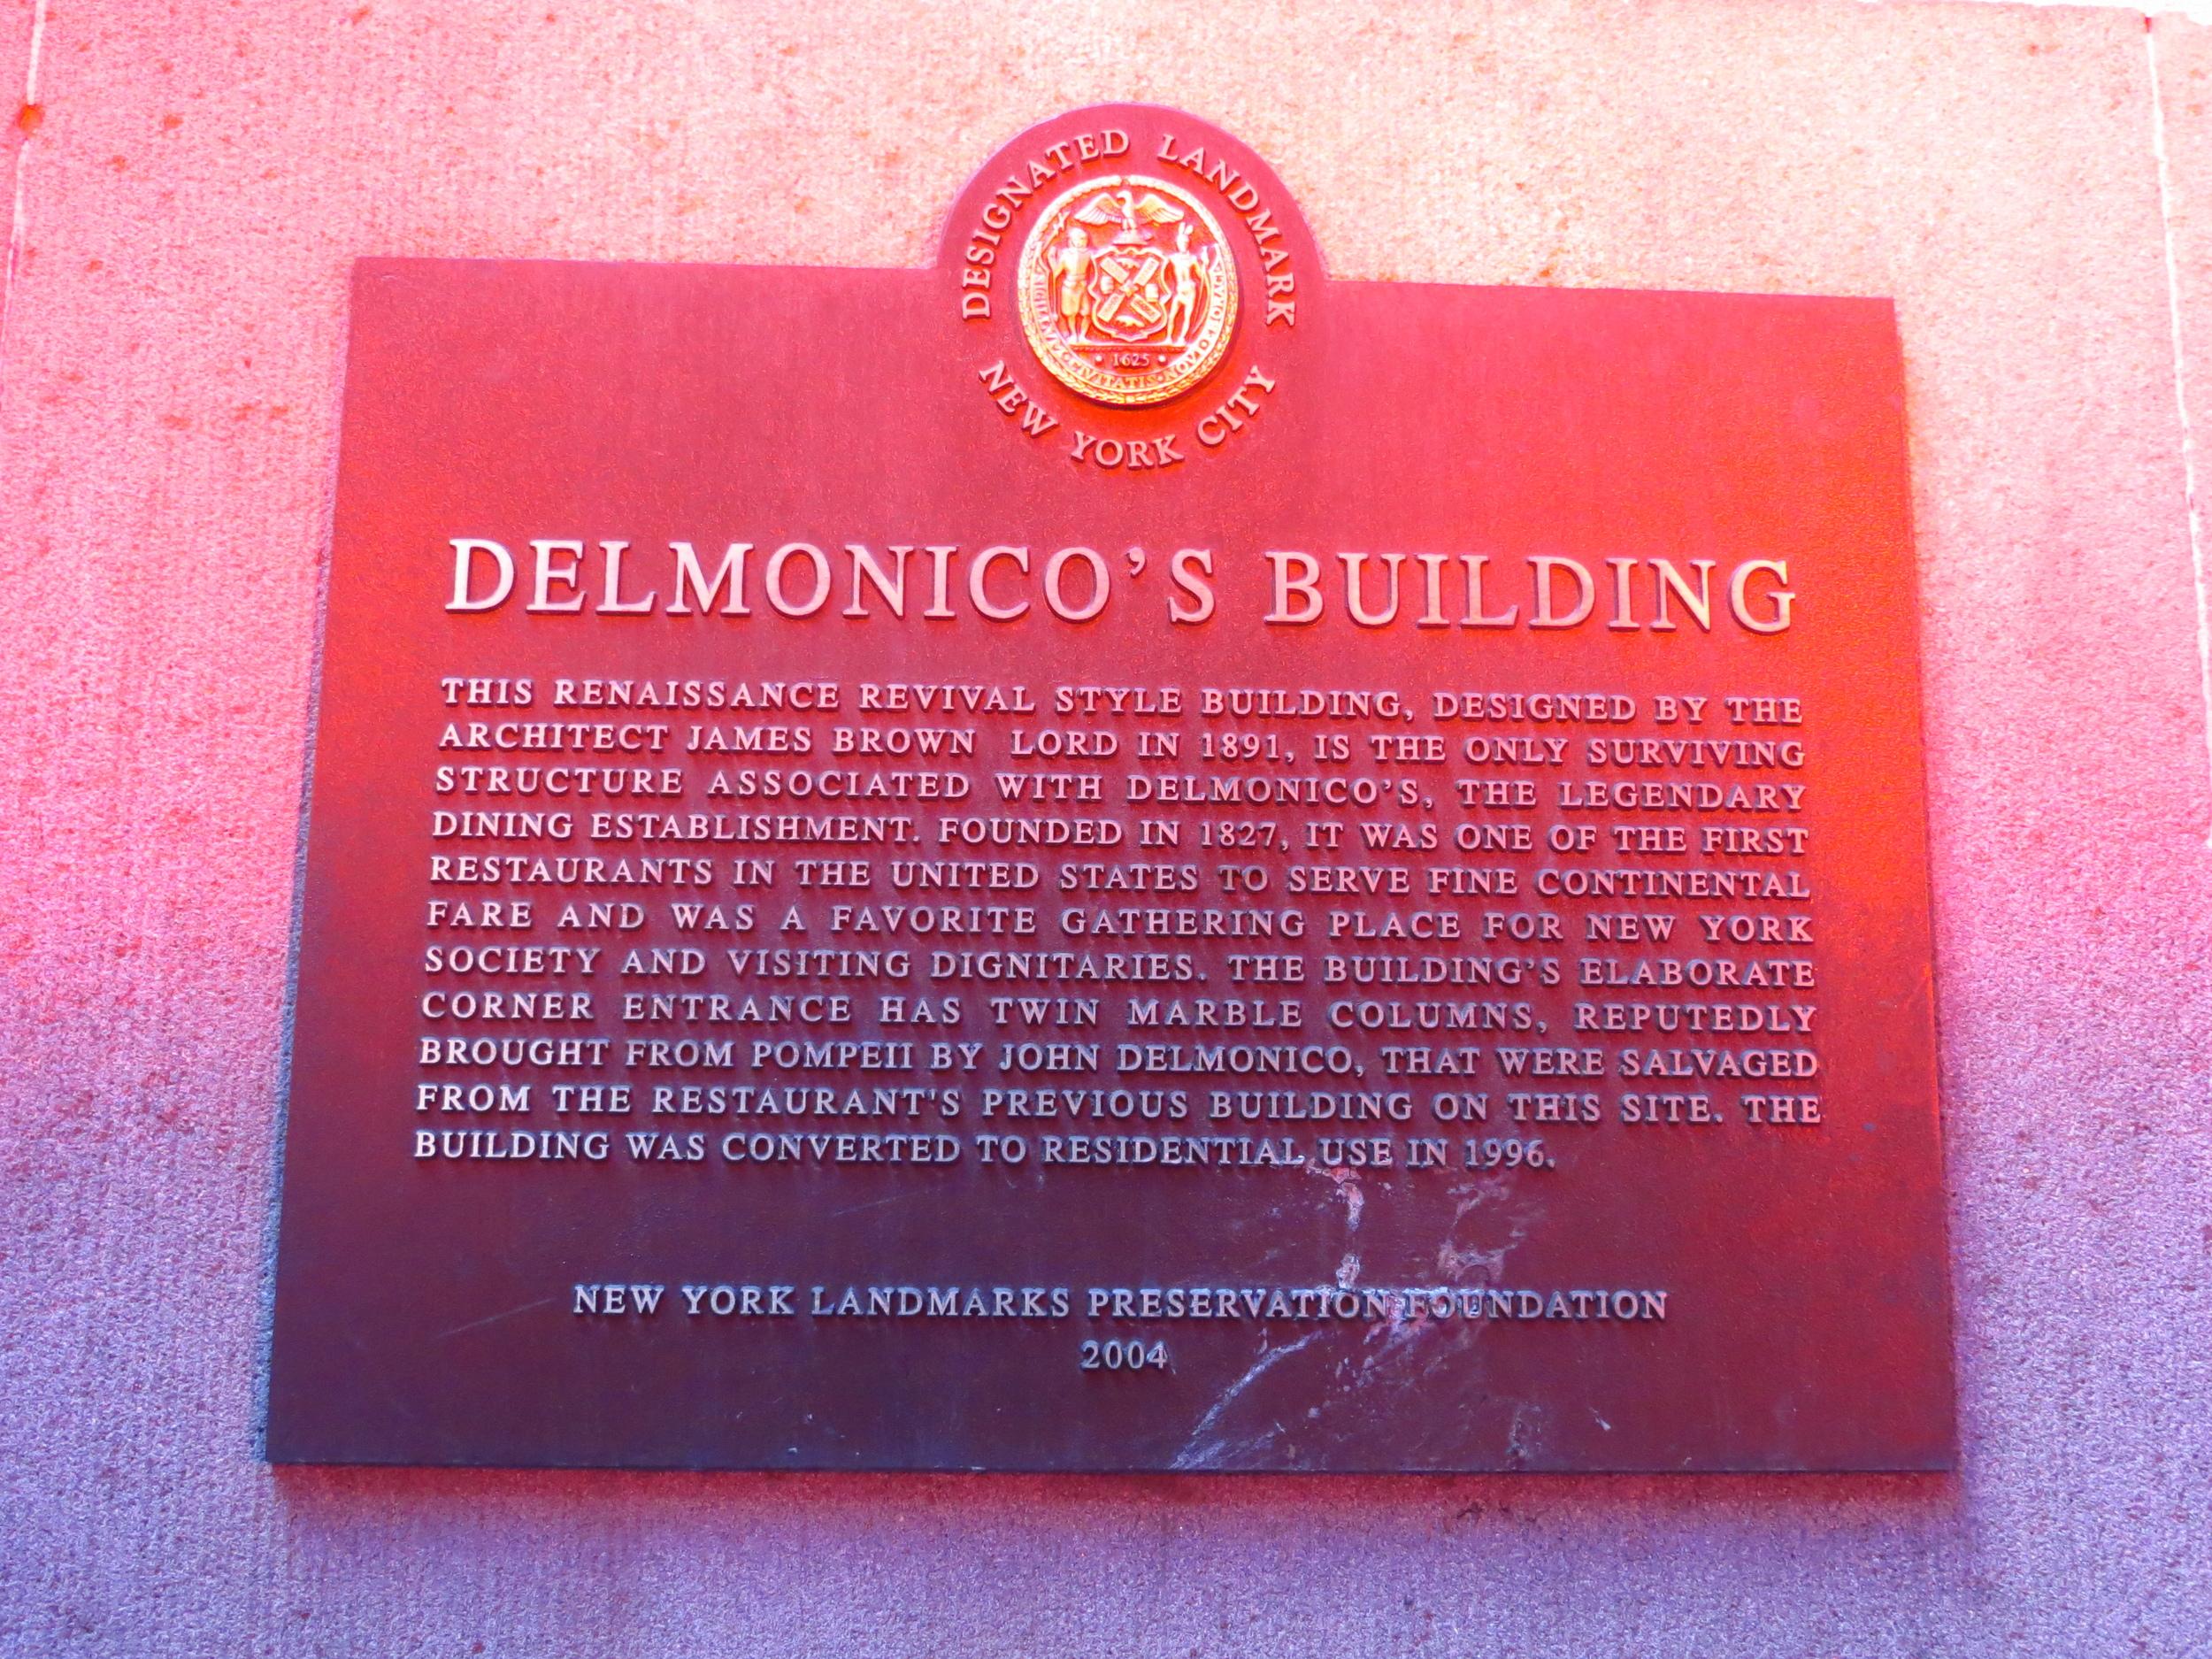 Delmonico's History